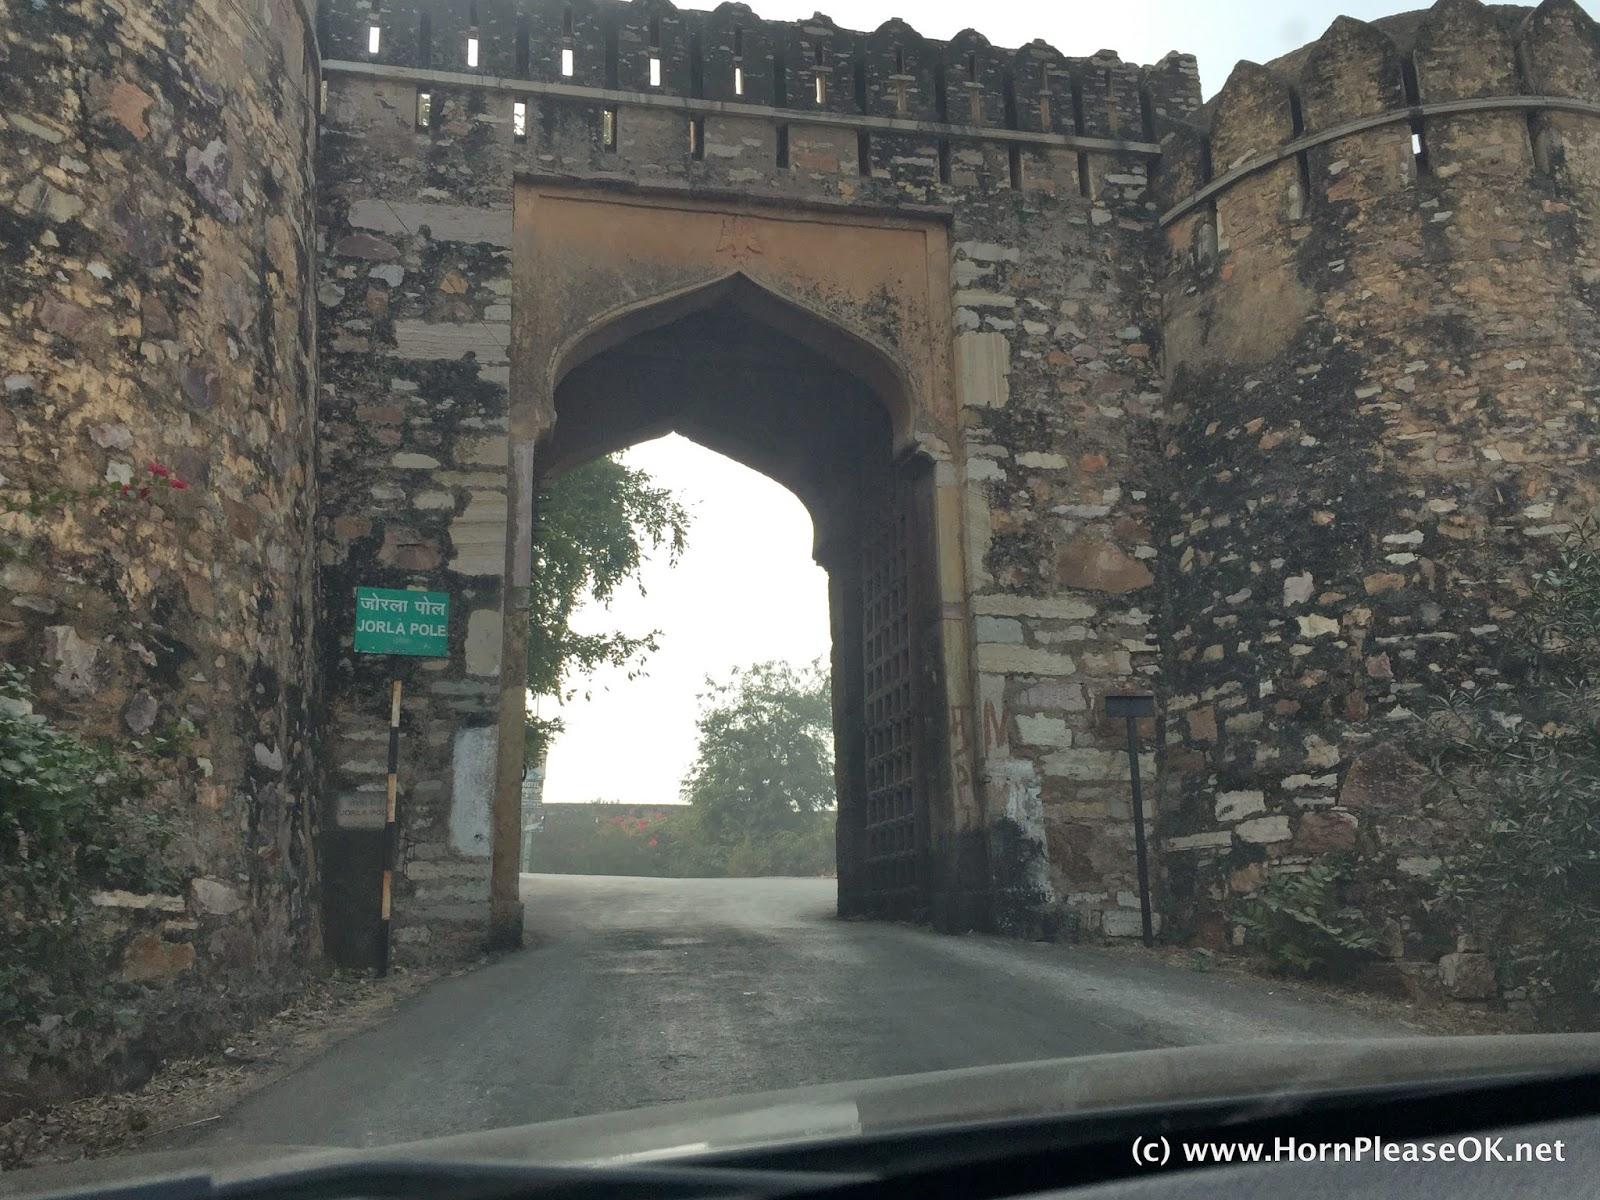 Jorla Pol, Chittorgarh Fort